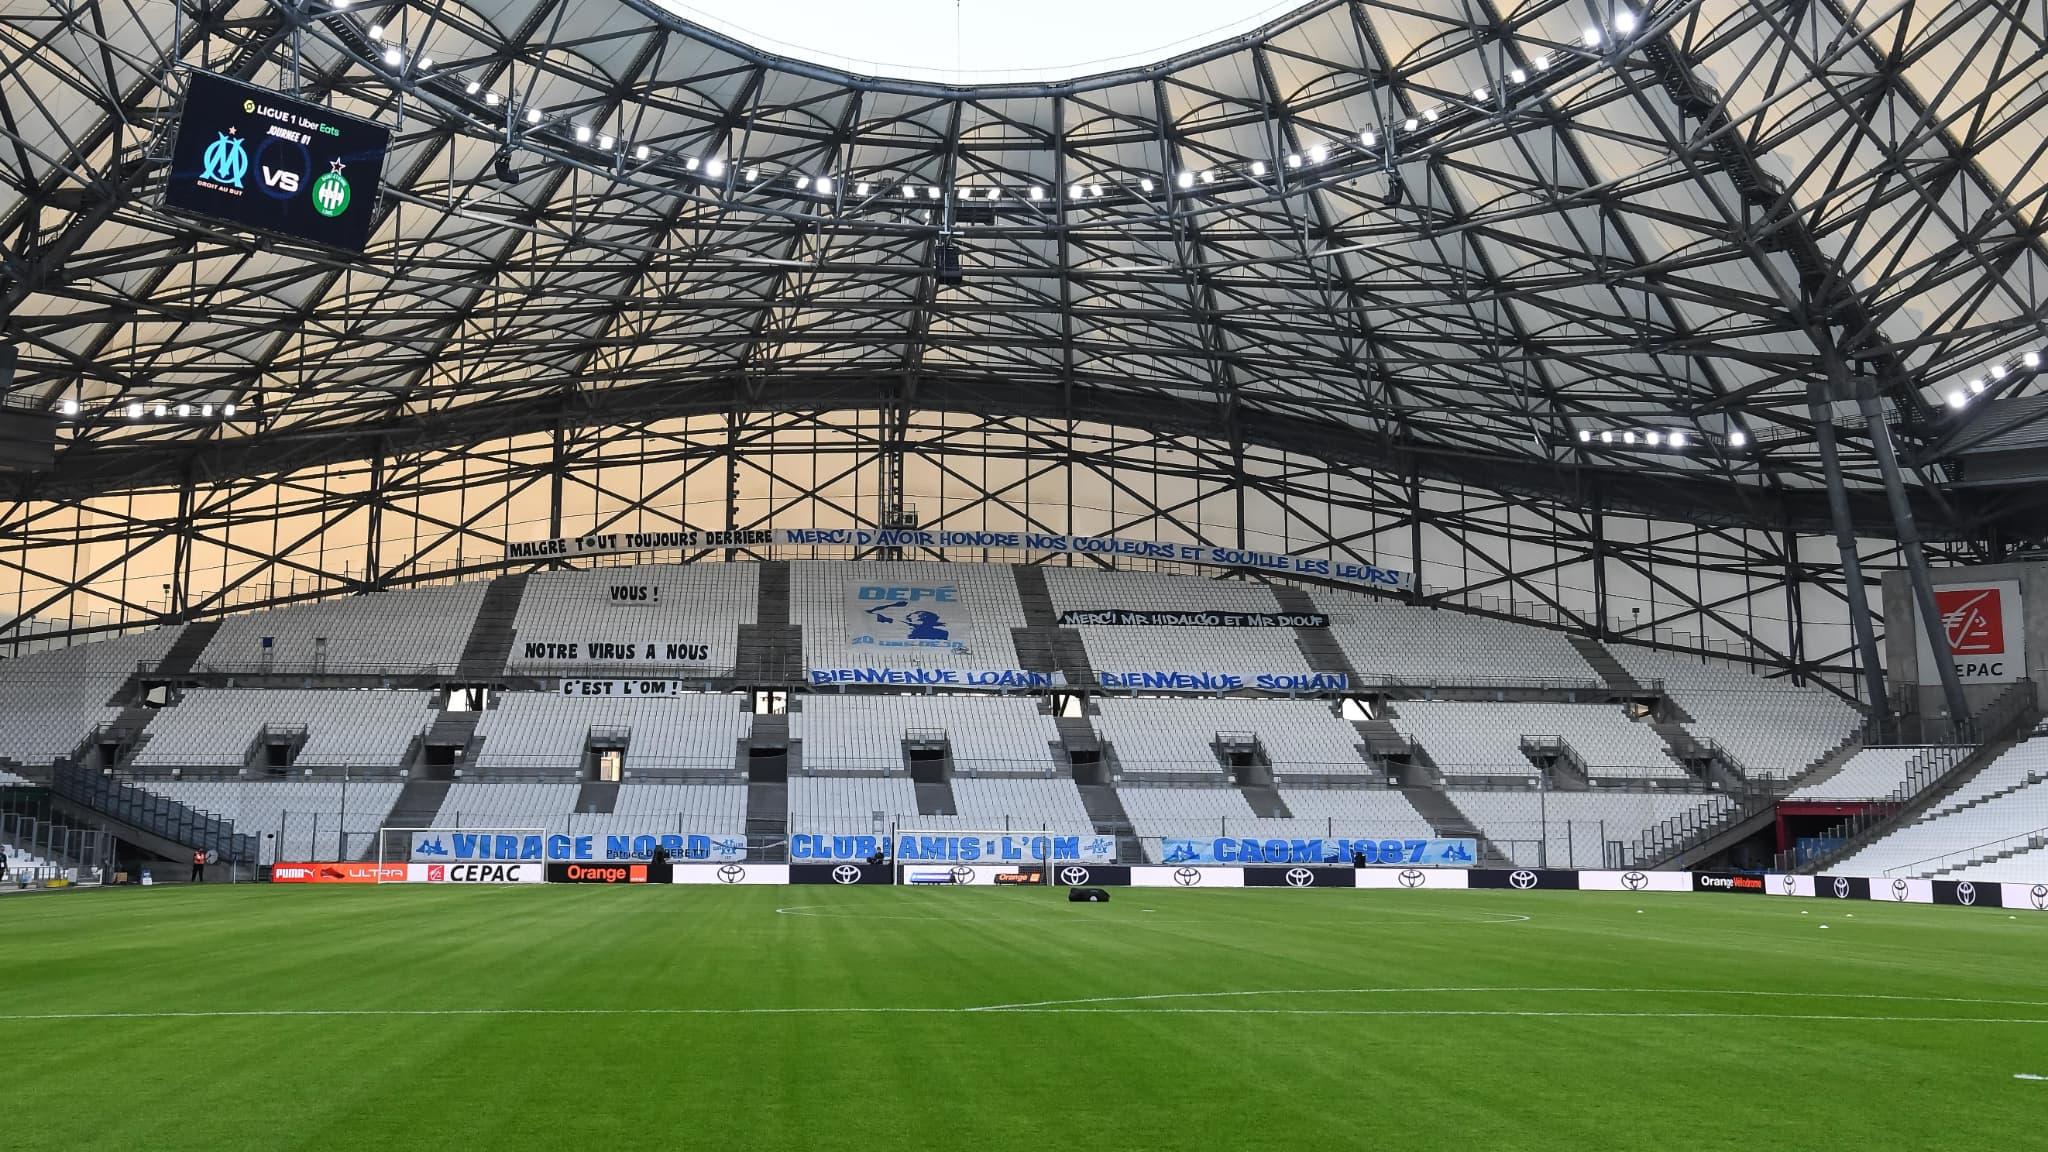 Covid-19: à Marseille, le stade Vélodrome va devenir un grand centre de vaccination - RMC Sport